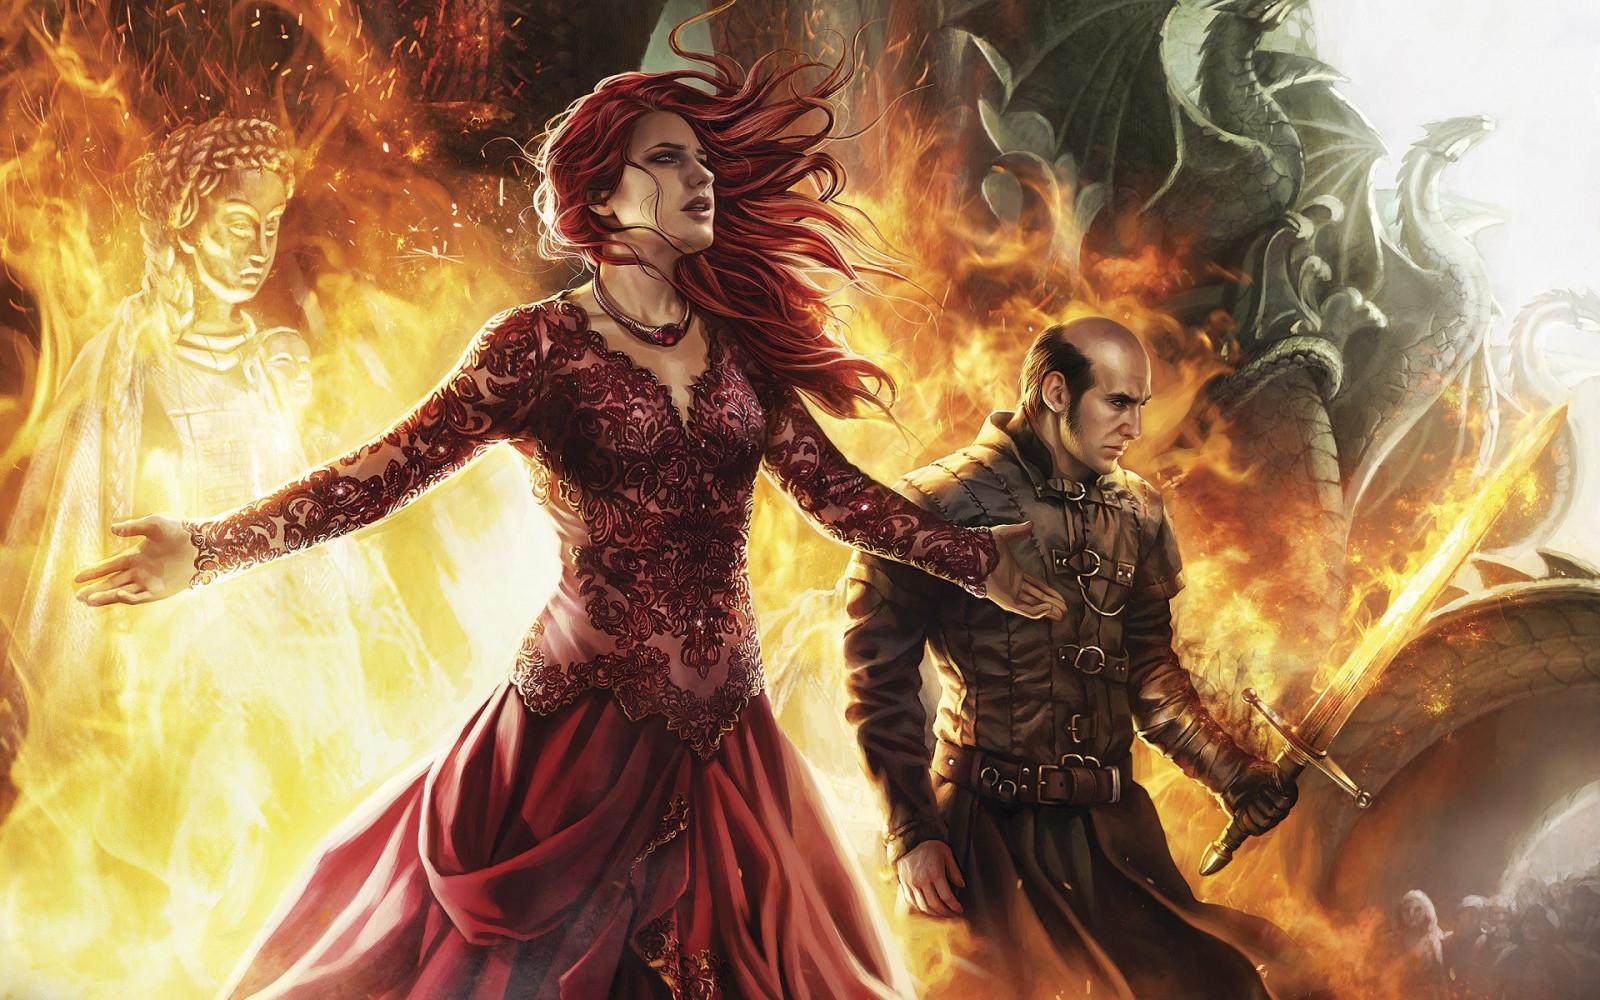 Wallpaper : digital art, women, redhead, fantasy art ... Fire And Ice Dragon Wallpaper